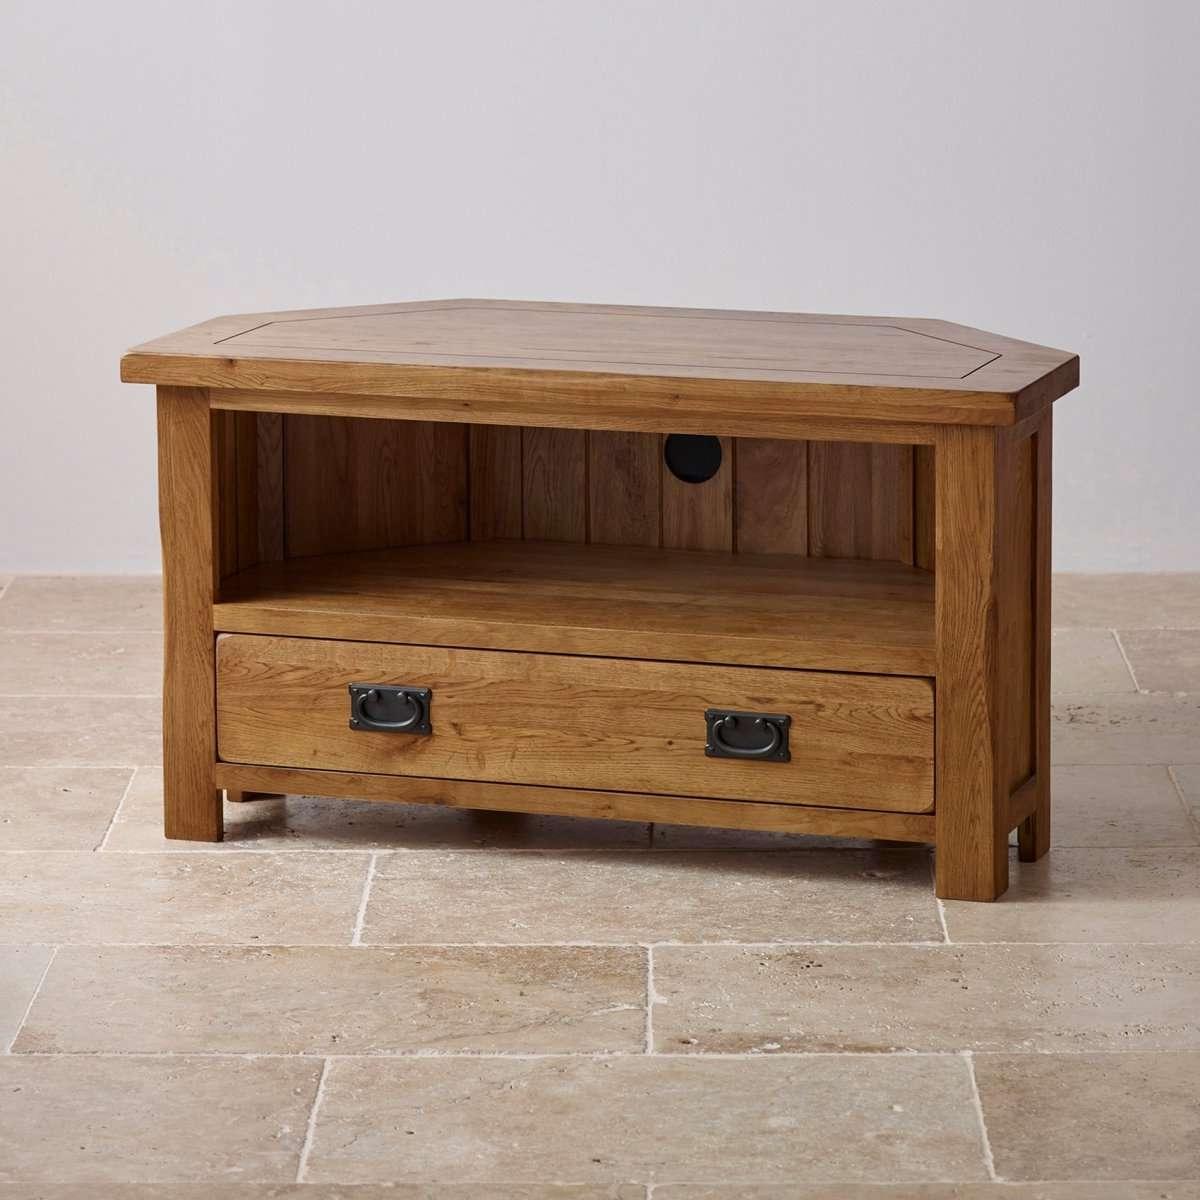 Wooden Corner Television Cabinets • Corner Cabinets Inside Solid Wood Corner Tv Cabinets (View 9 of 20)